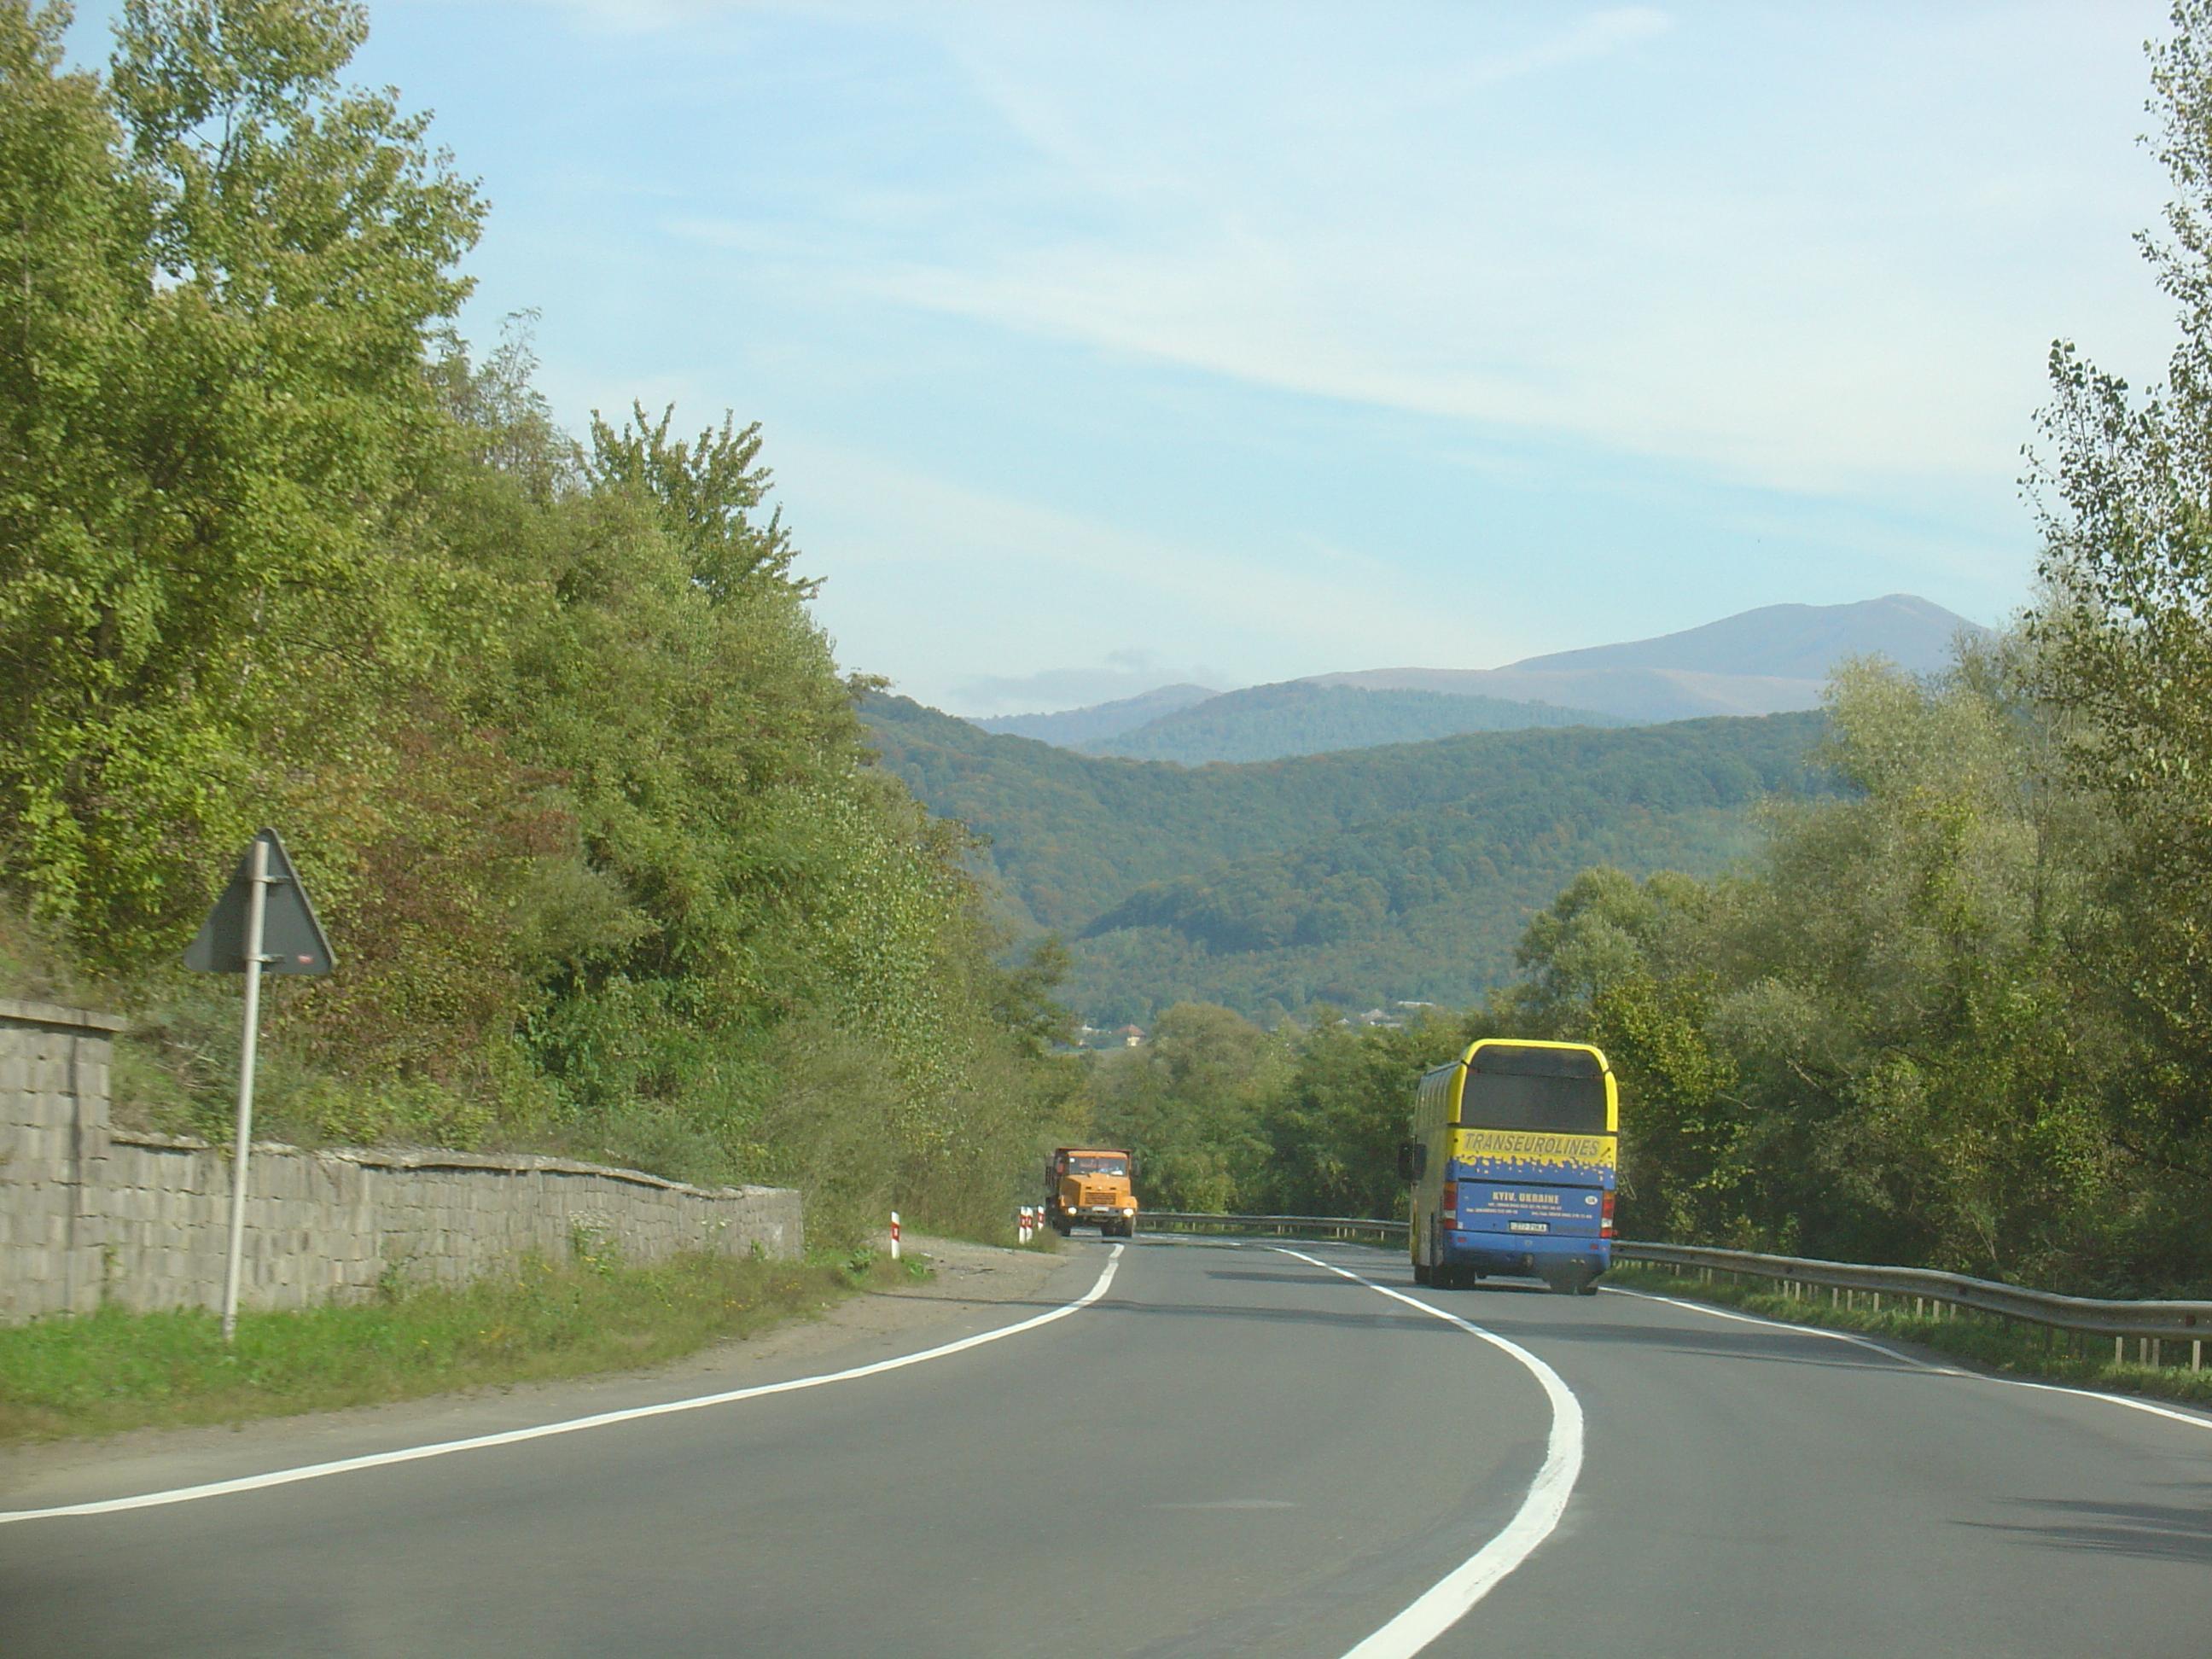 File:Автошлях E471, Закарпатська обл..JPG - Wikimedia Commons